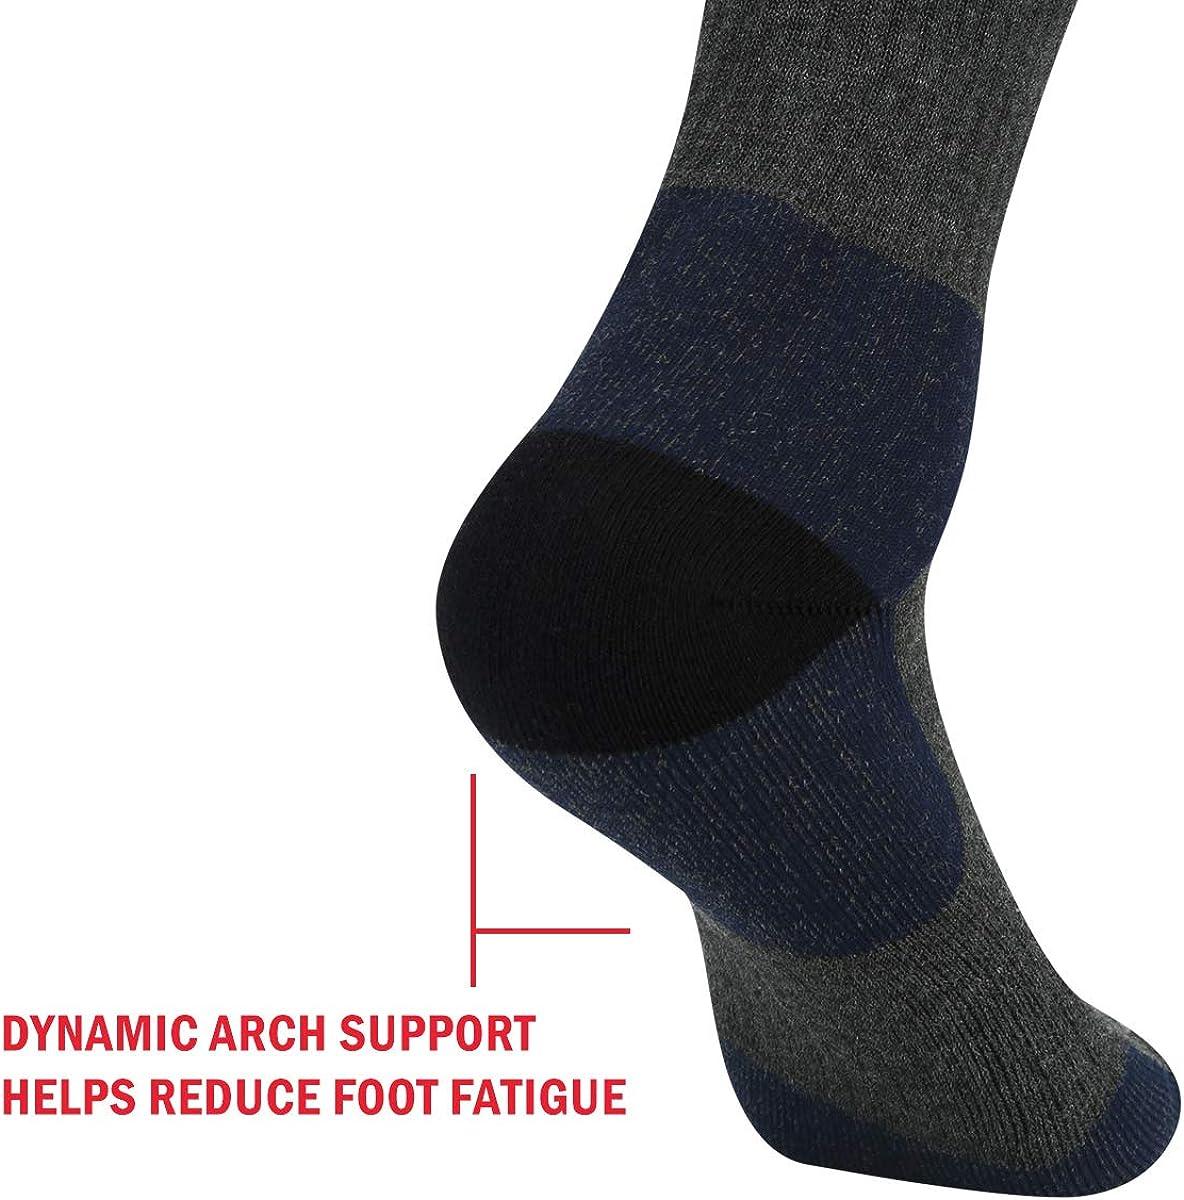 YUEDGE Mens Performance Moisture Wicking Cotton Cushion Crew Socks Work Boot Outdoor Sports Athletic Walking Hiking Socks